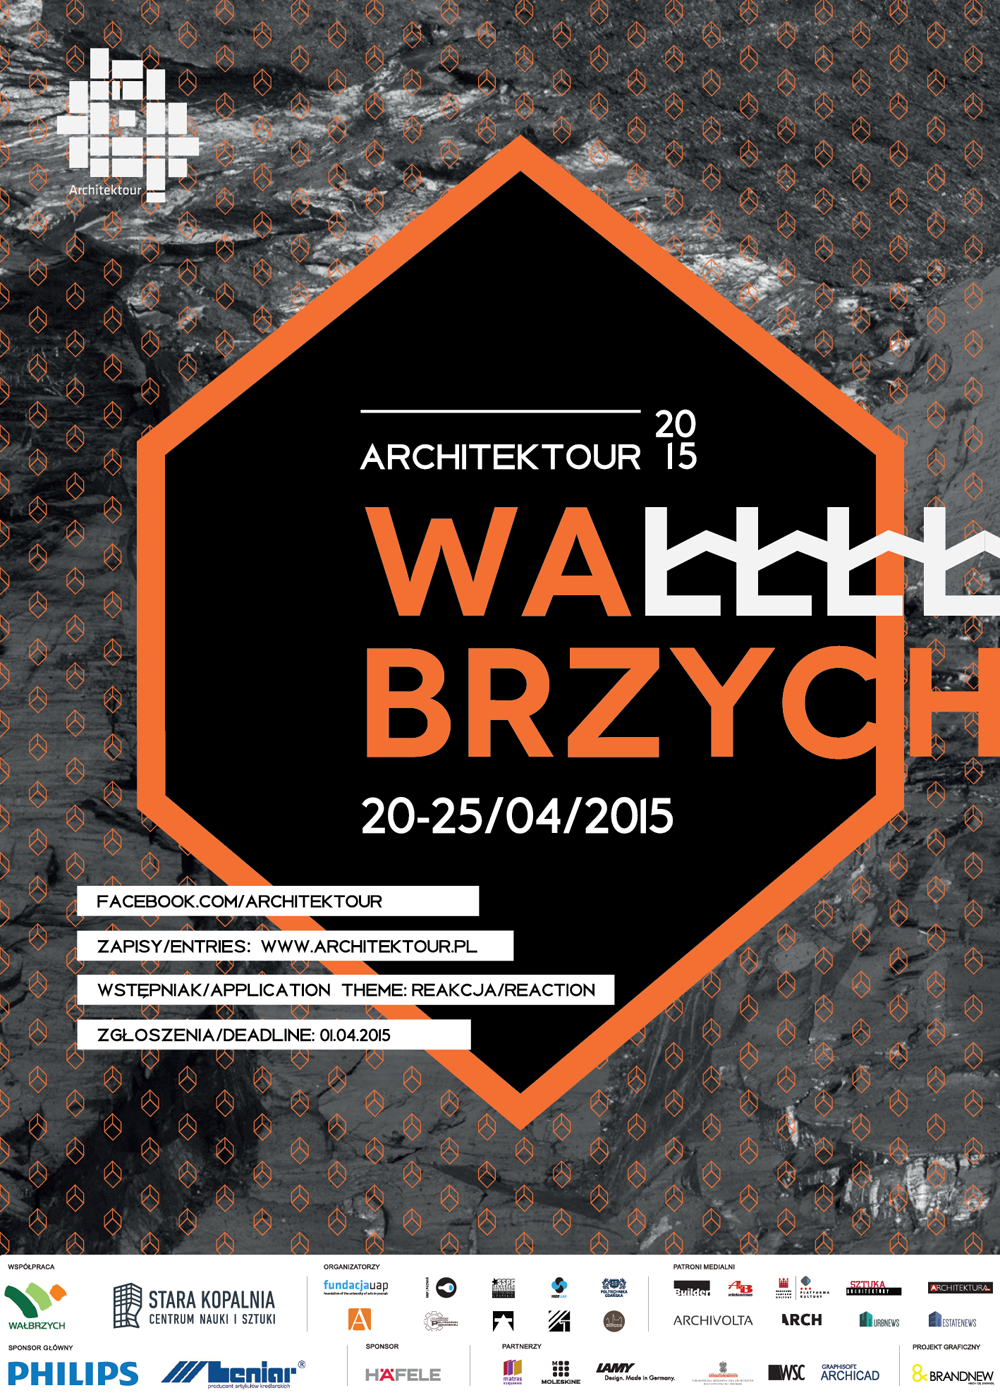 plakat_architektour_27.03.15